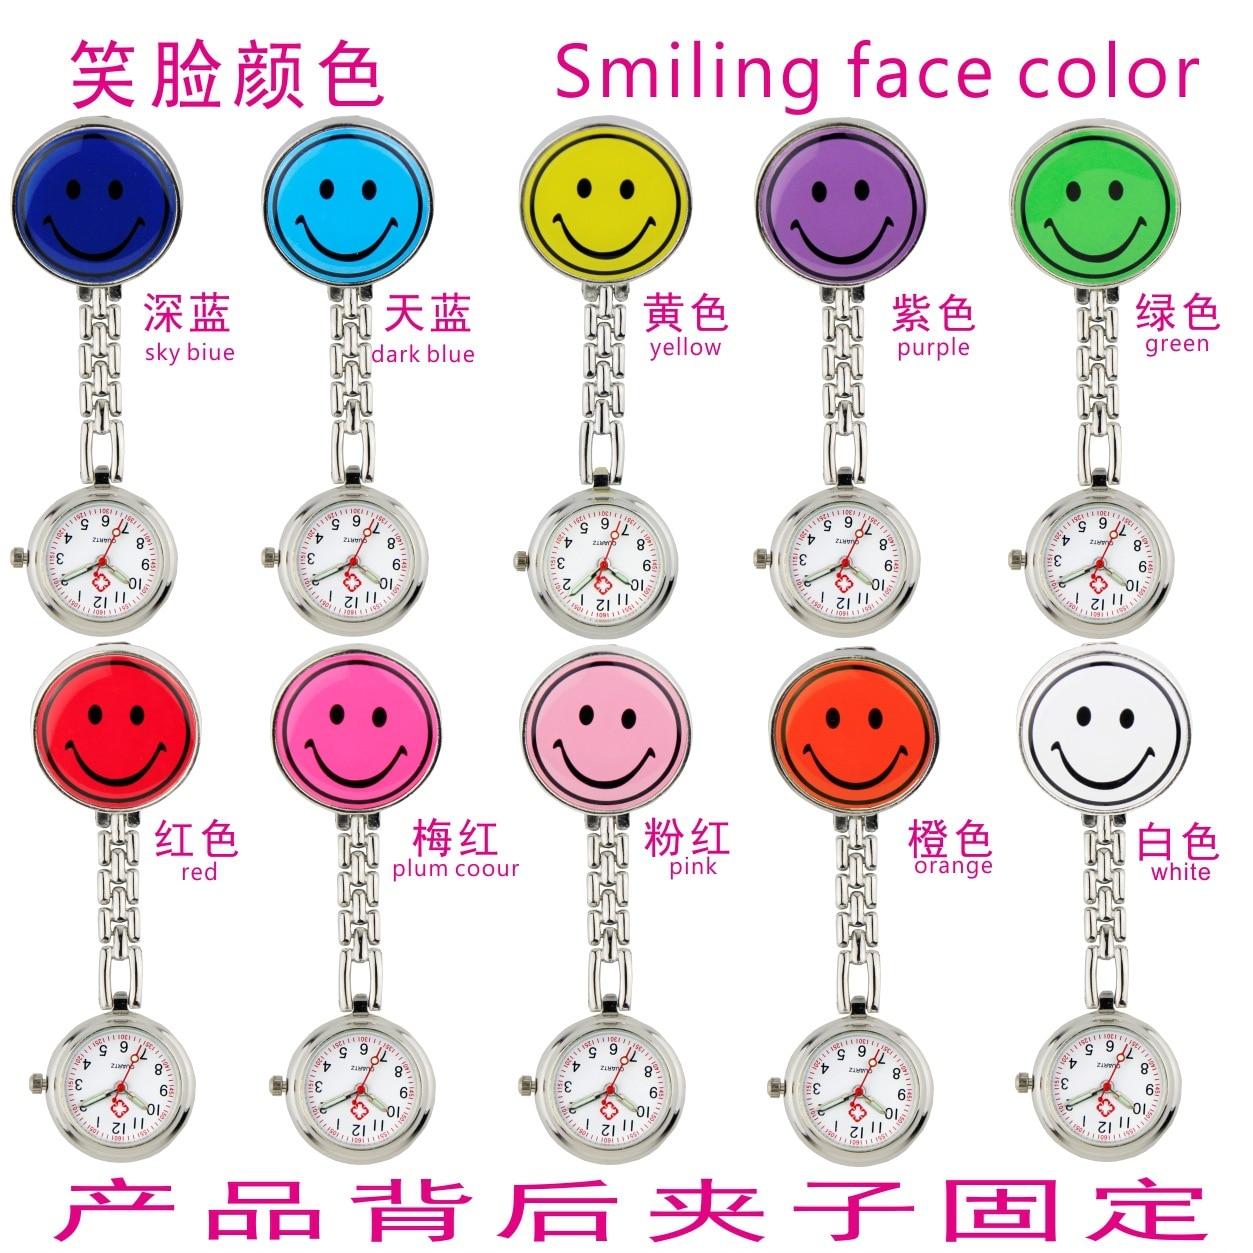 2021 New Fashion Ladies Cute Love Smiling Face Quartz Bracelet Brooch Nurse Pocket FOB Watch Luminous Pointer Ladies Girls Gift enlarge